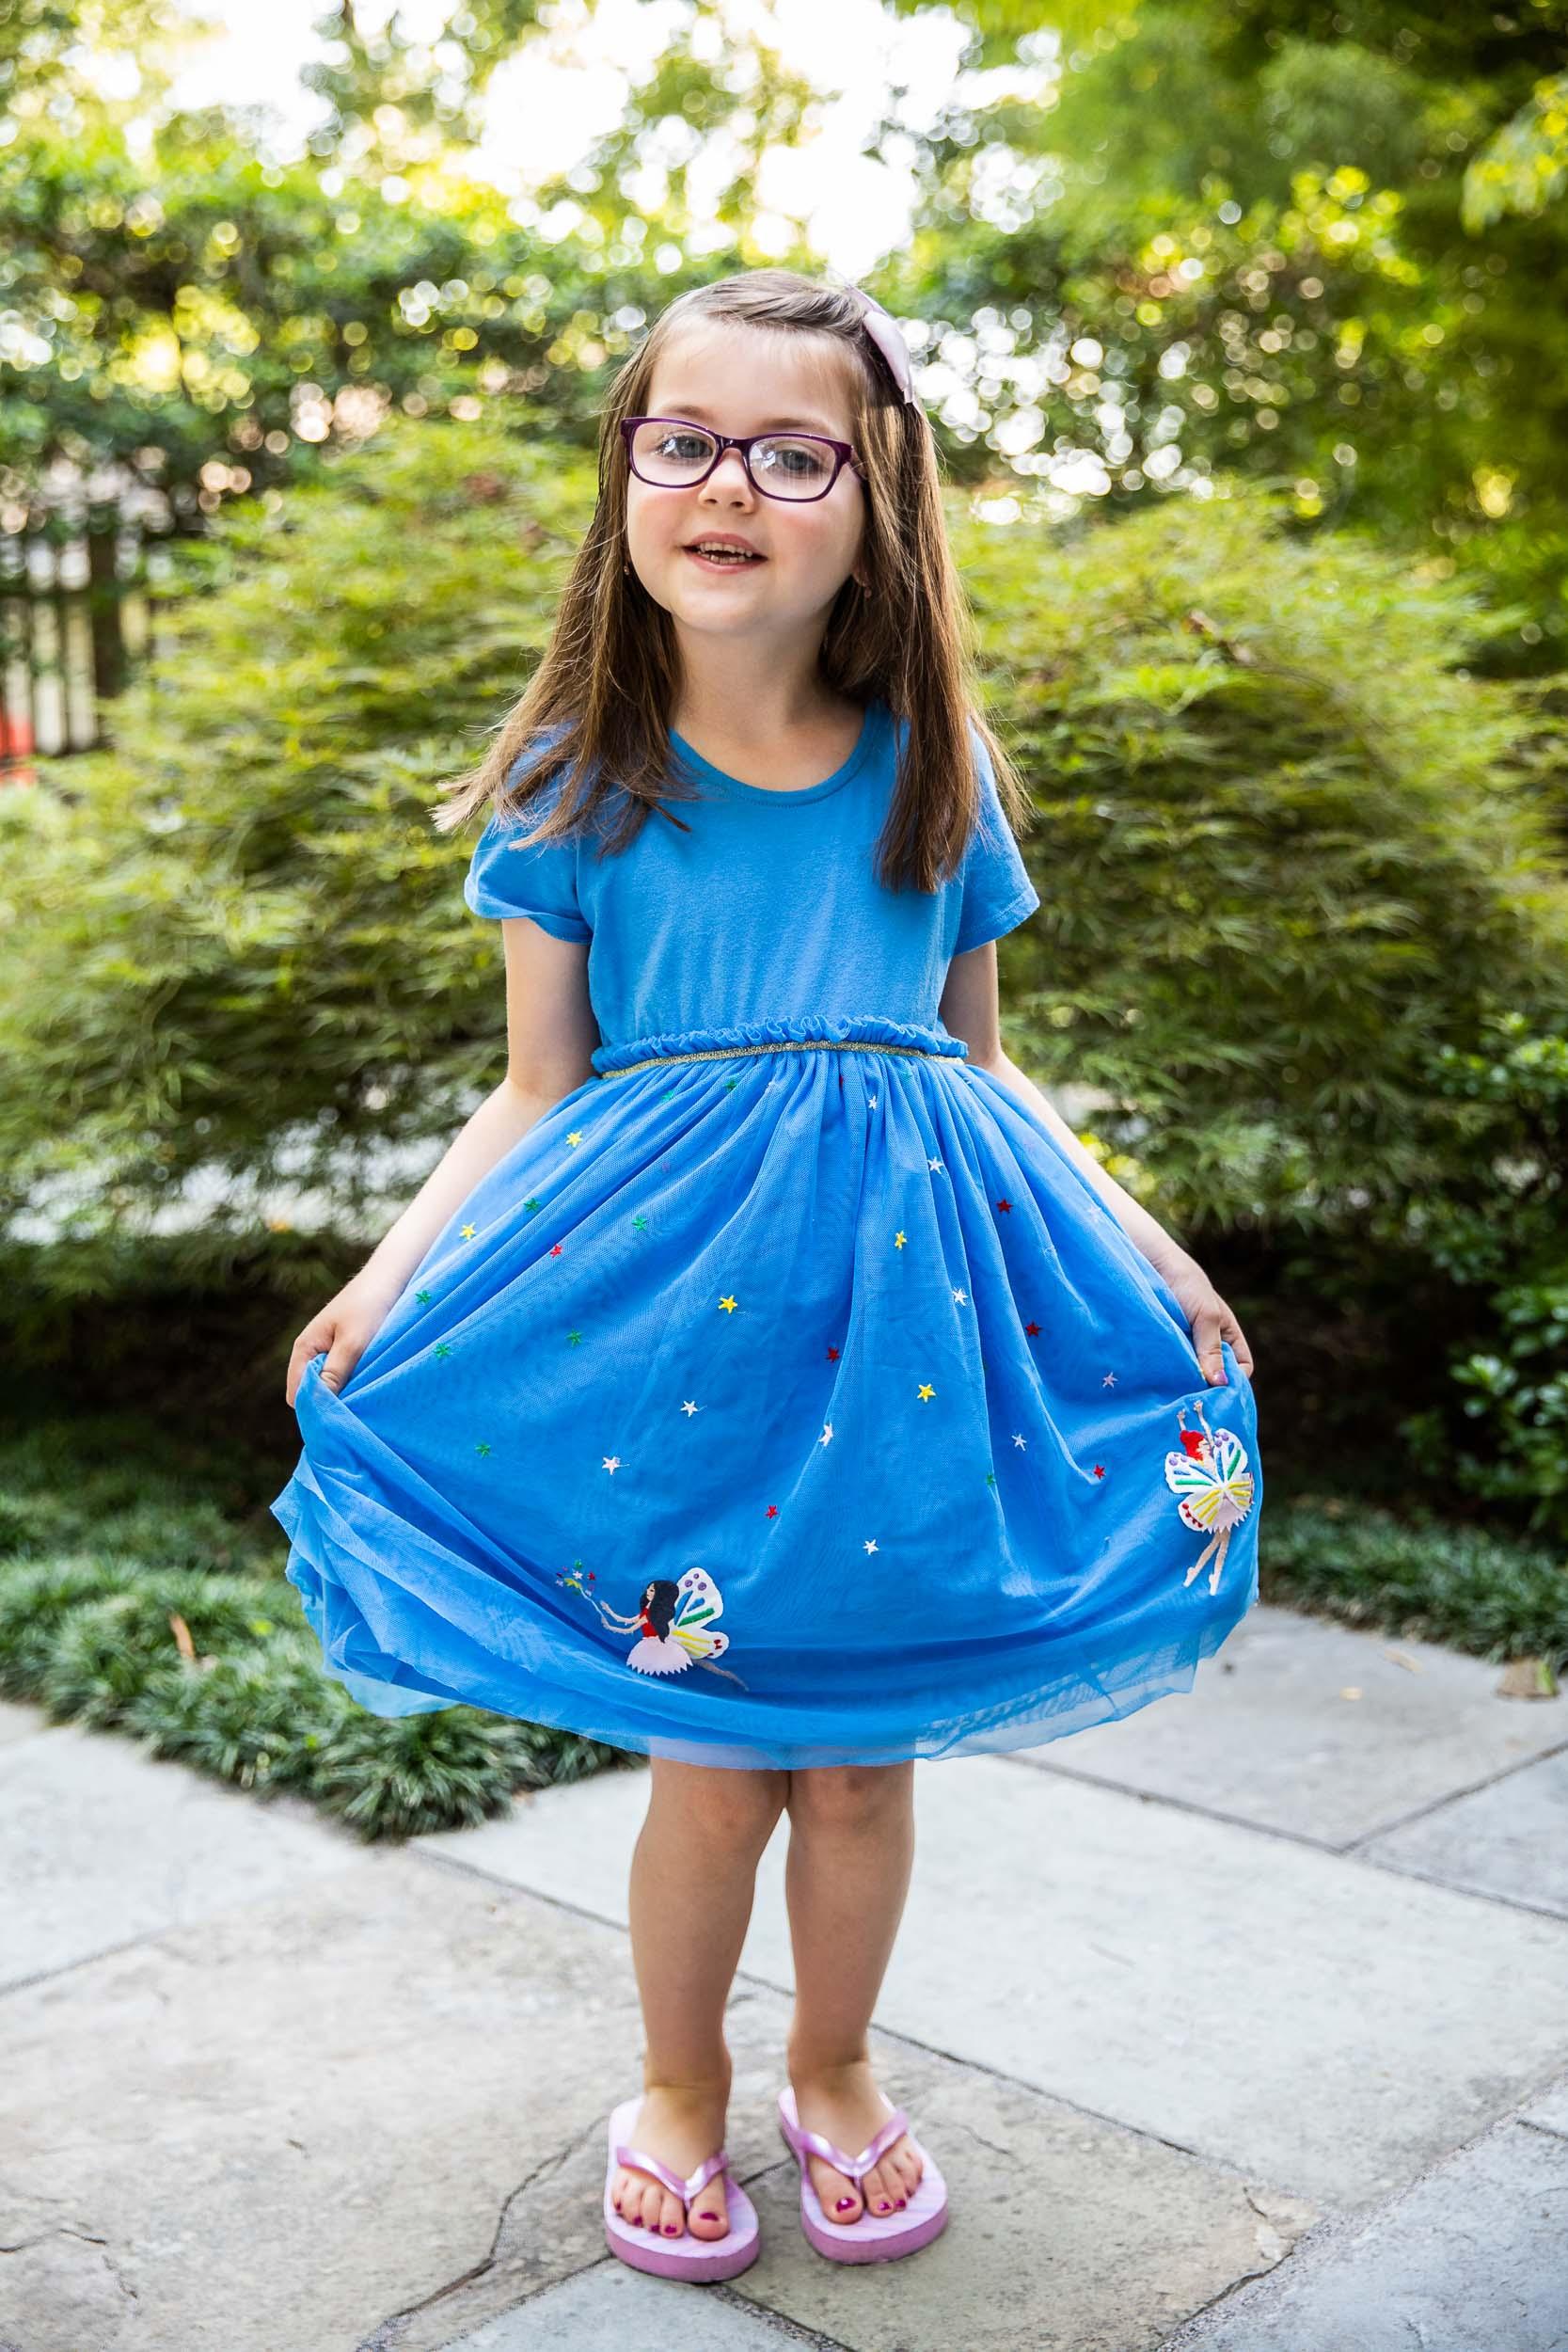 Chevy Chase MD Backyard Family Portraits Maryland Photography Tara Parekh Photography -06.jpg